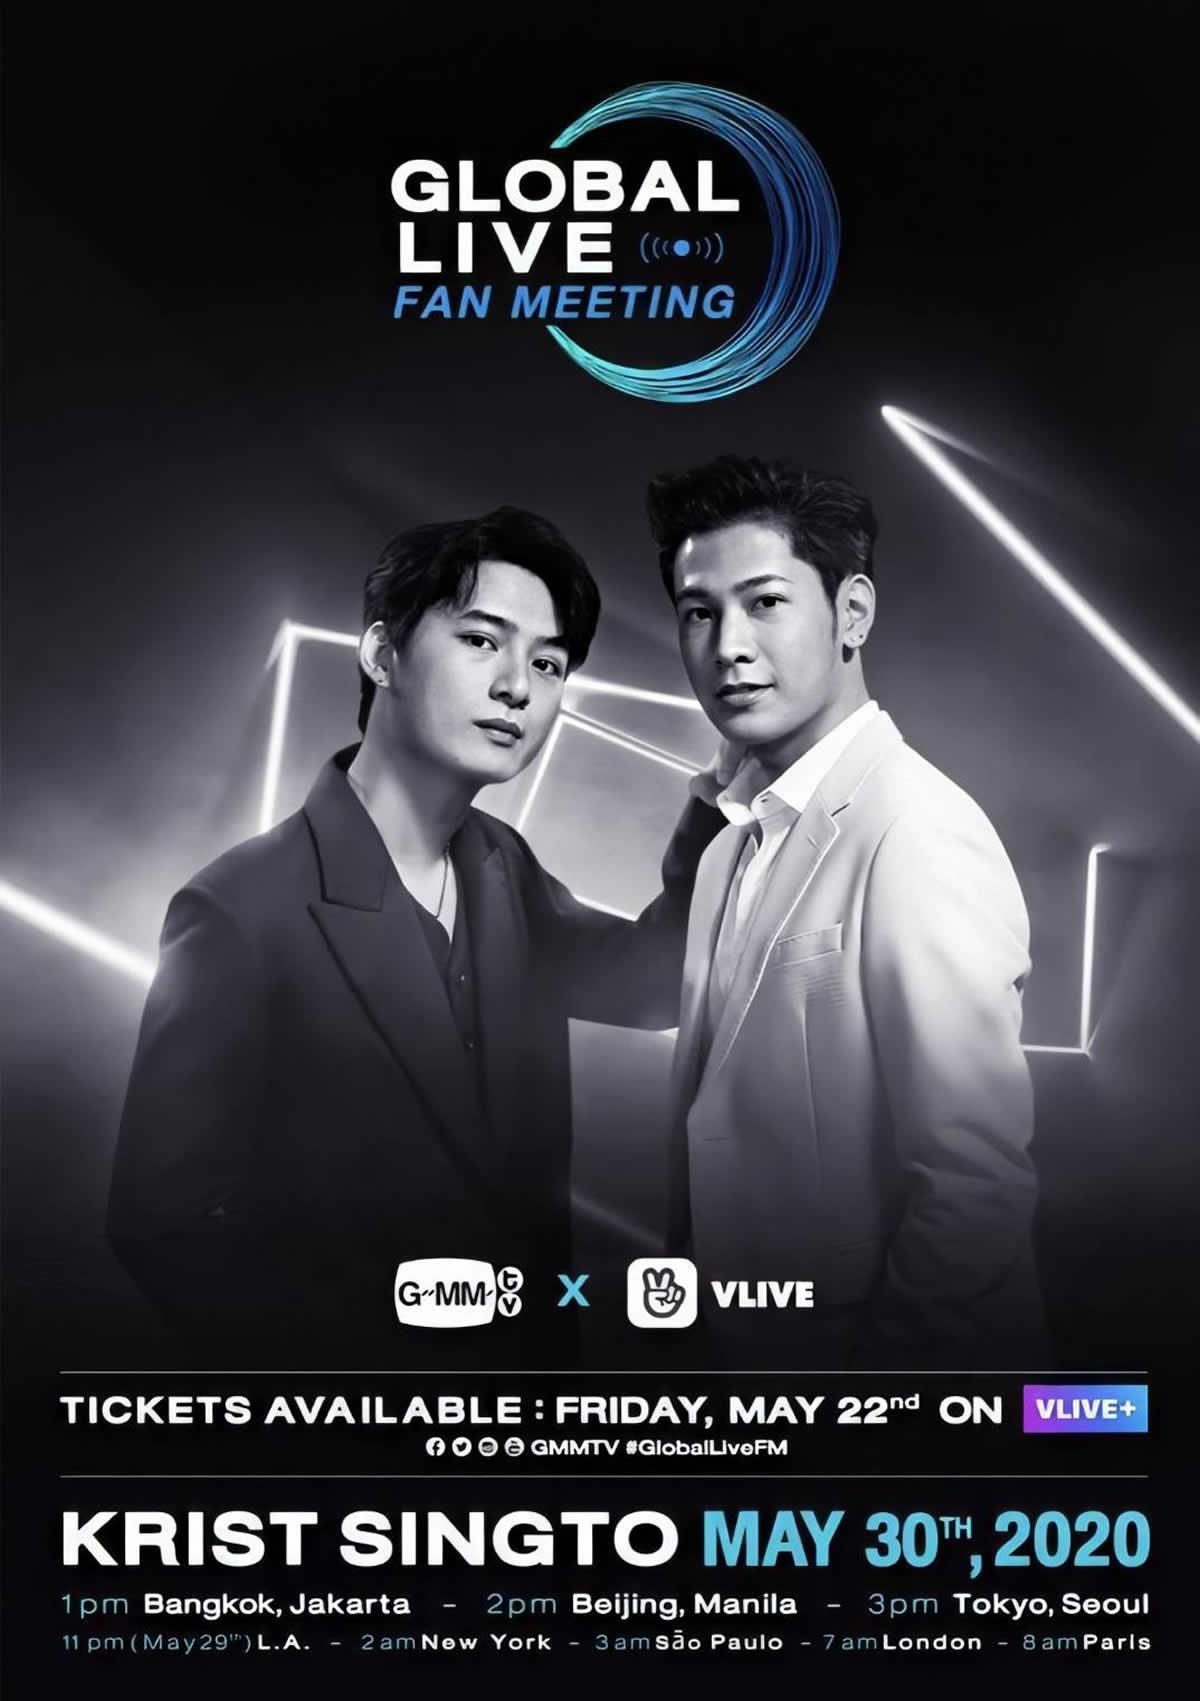 Krist&SingtoがGMMTV主催「GLOBAL LIVE FAN MEETING」に出演!